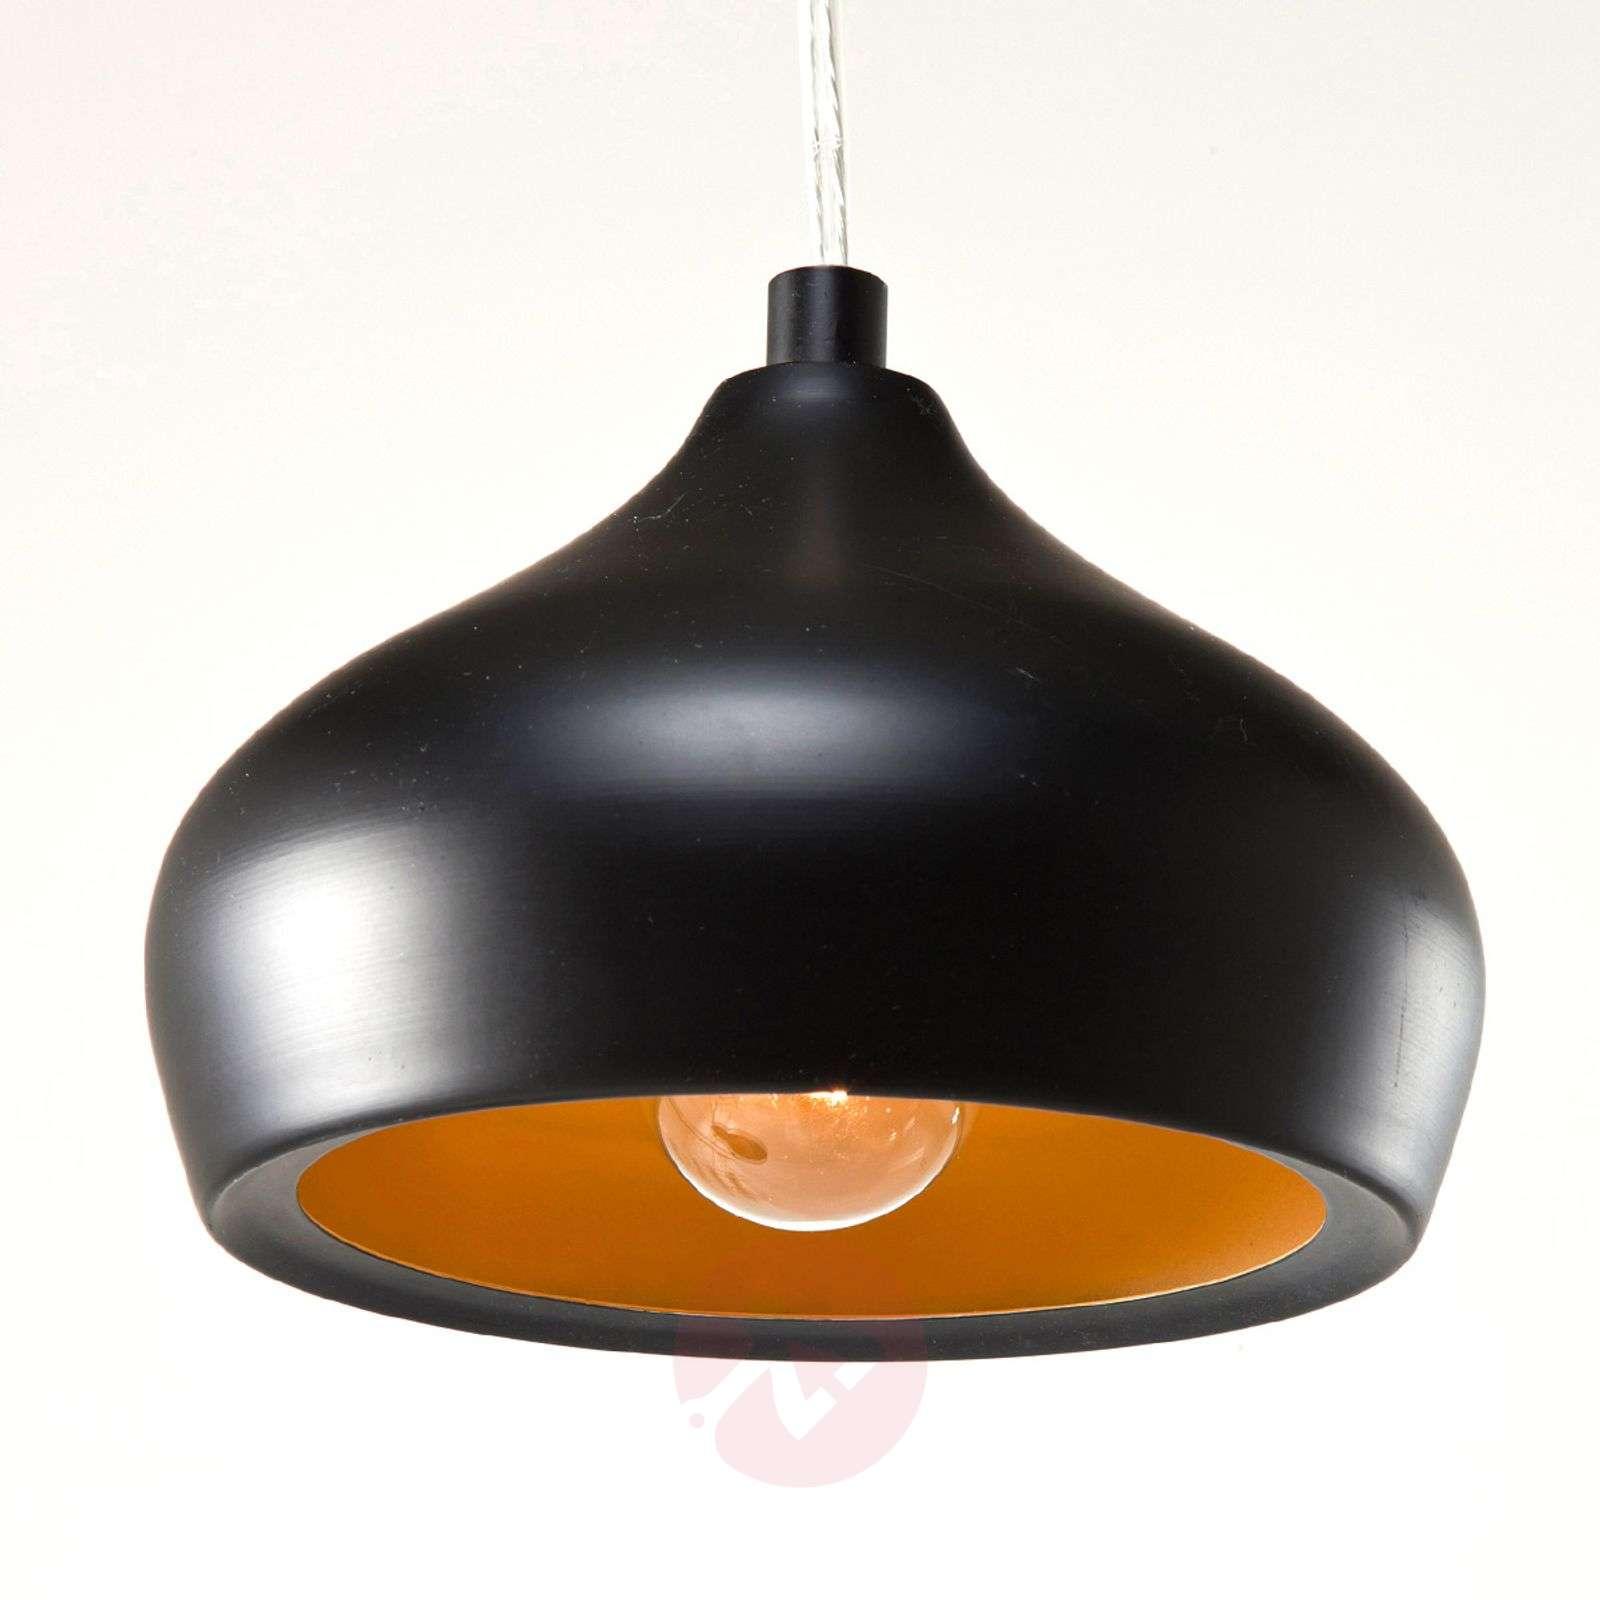 KARE Shades Dining designer hanging light-5517336-01